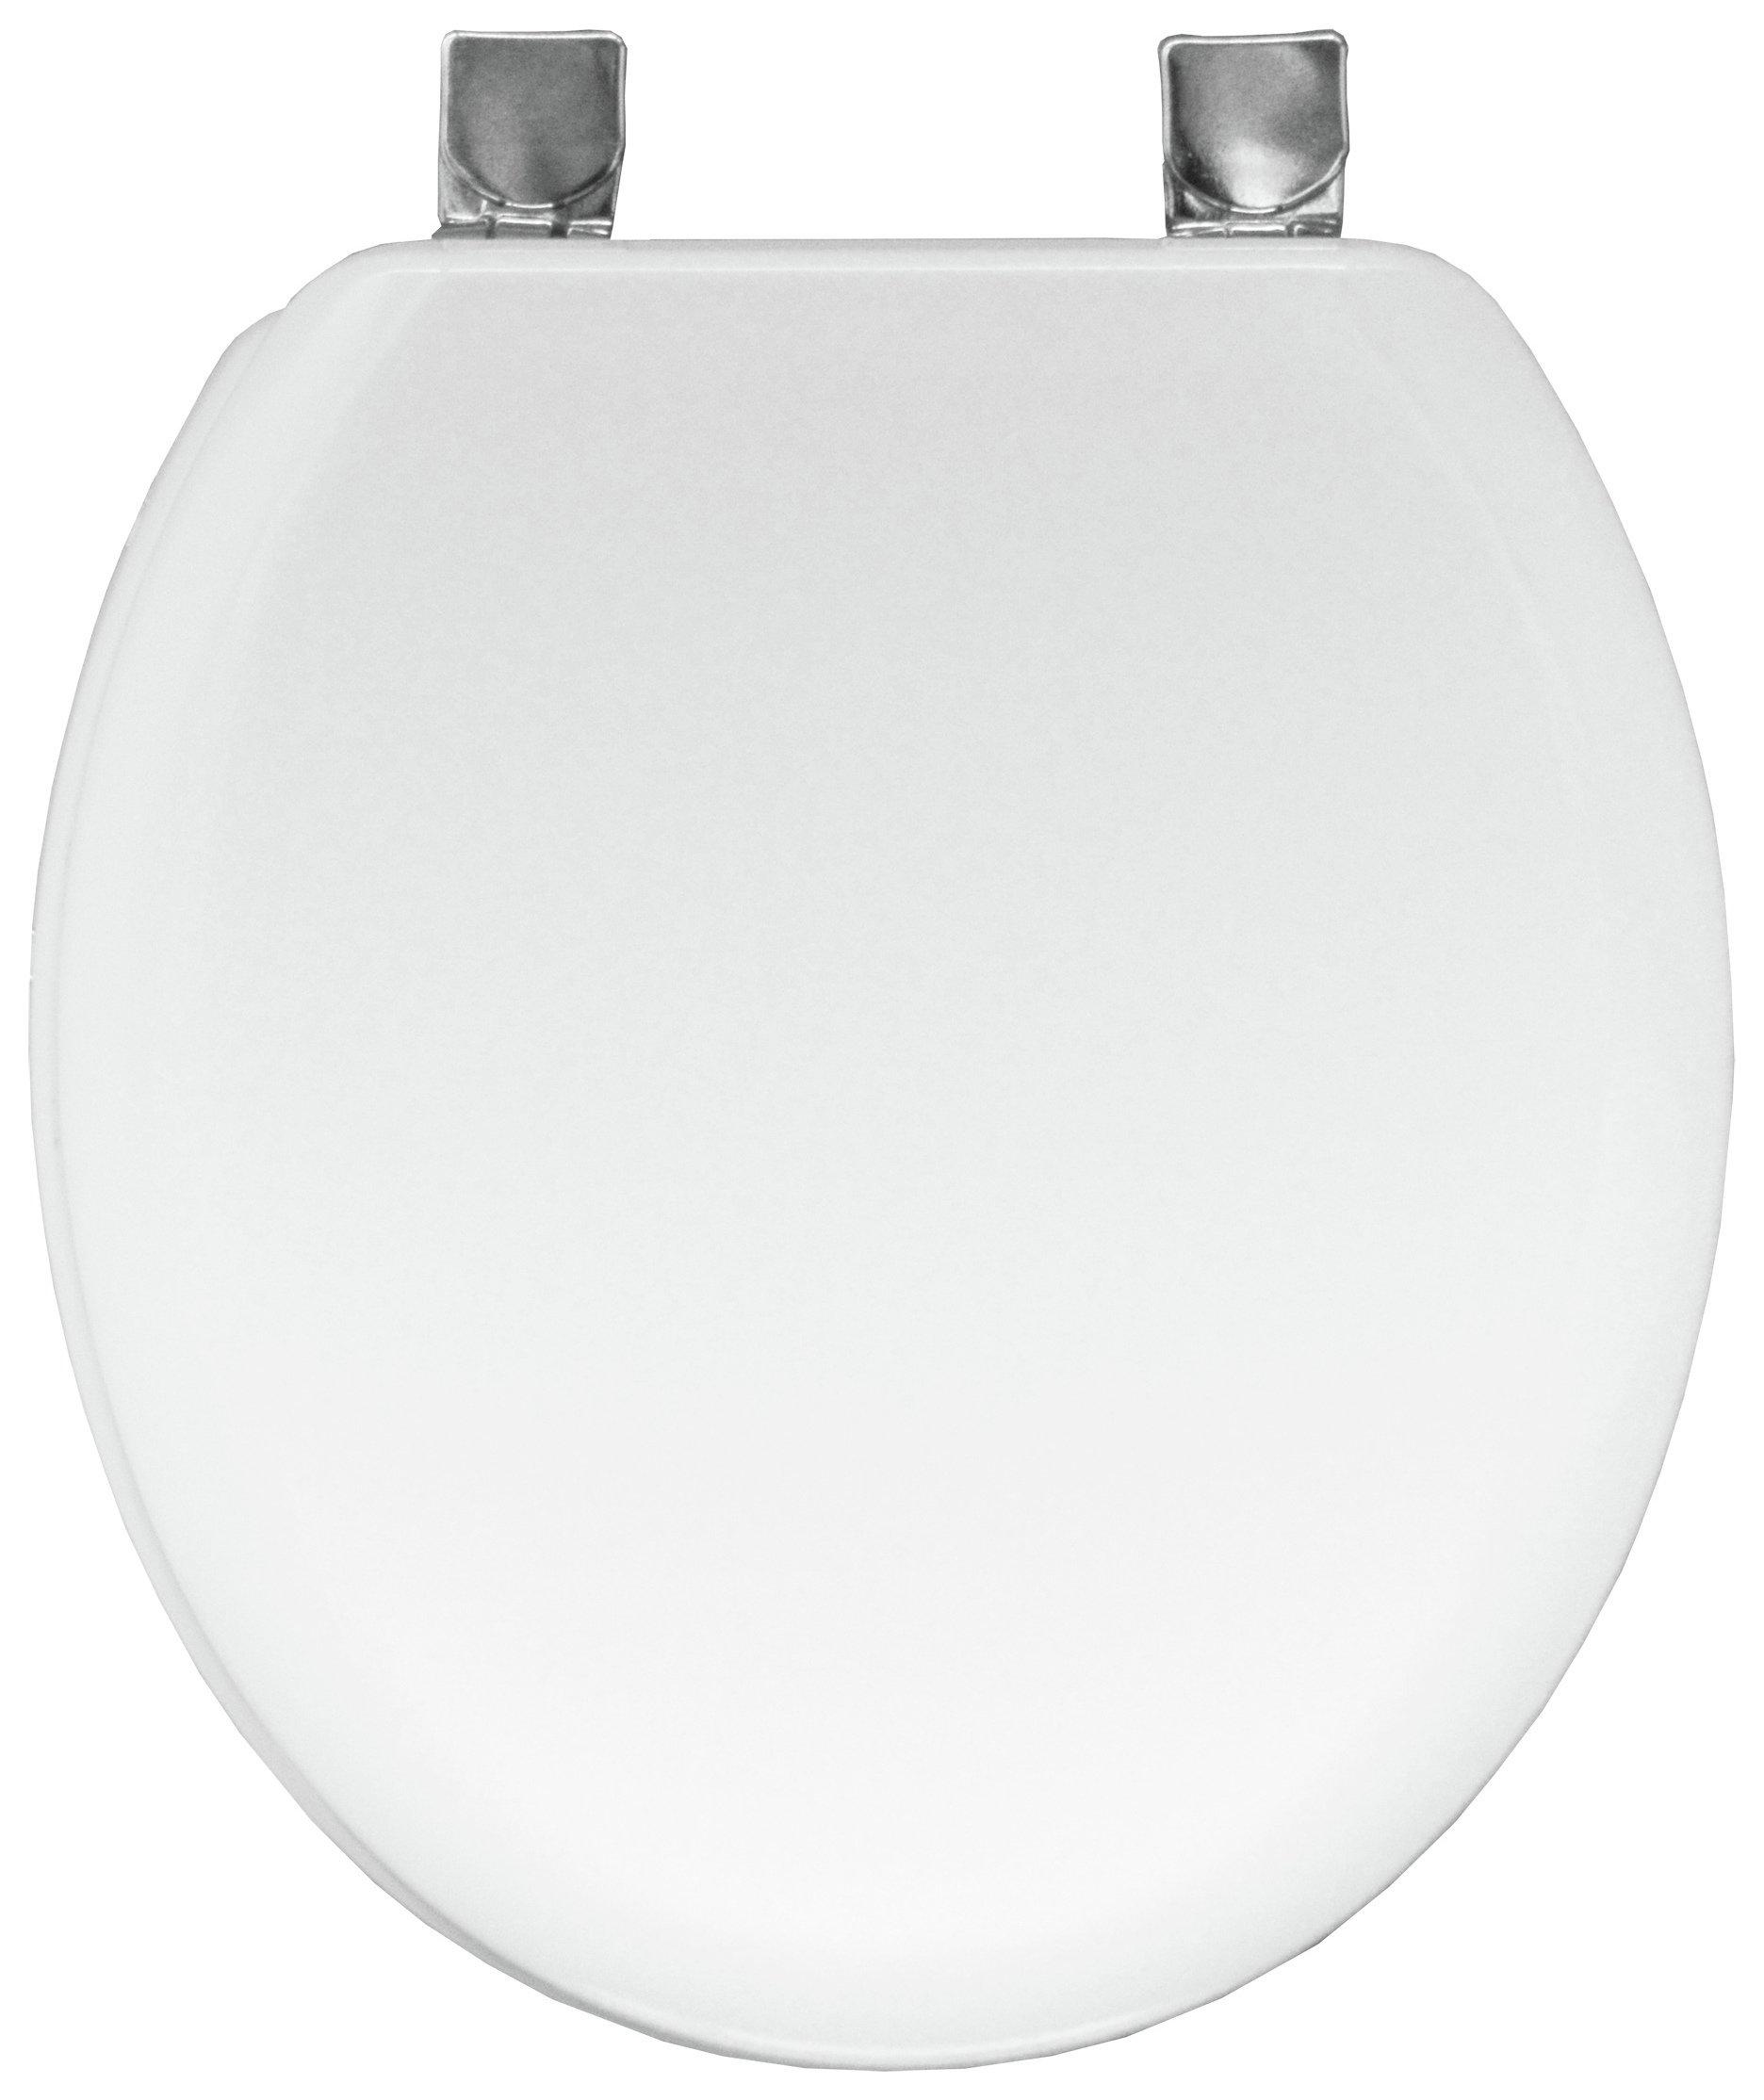 bemis chicago statite toilet seat